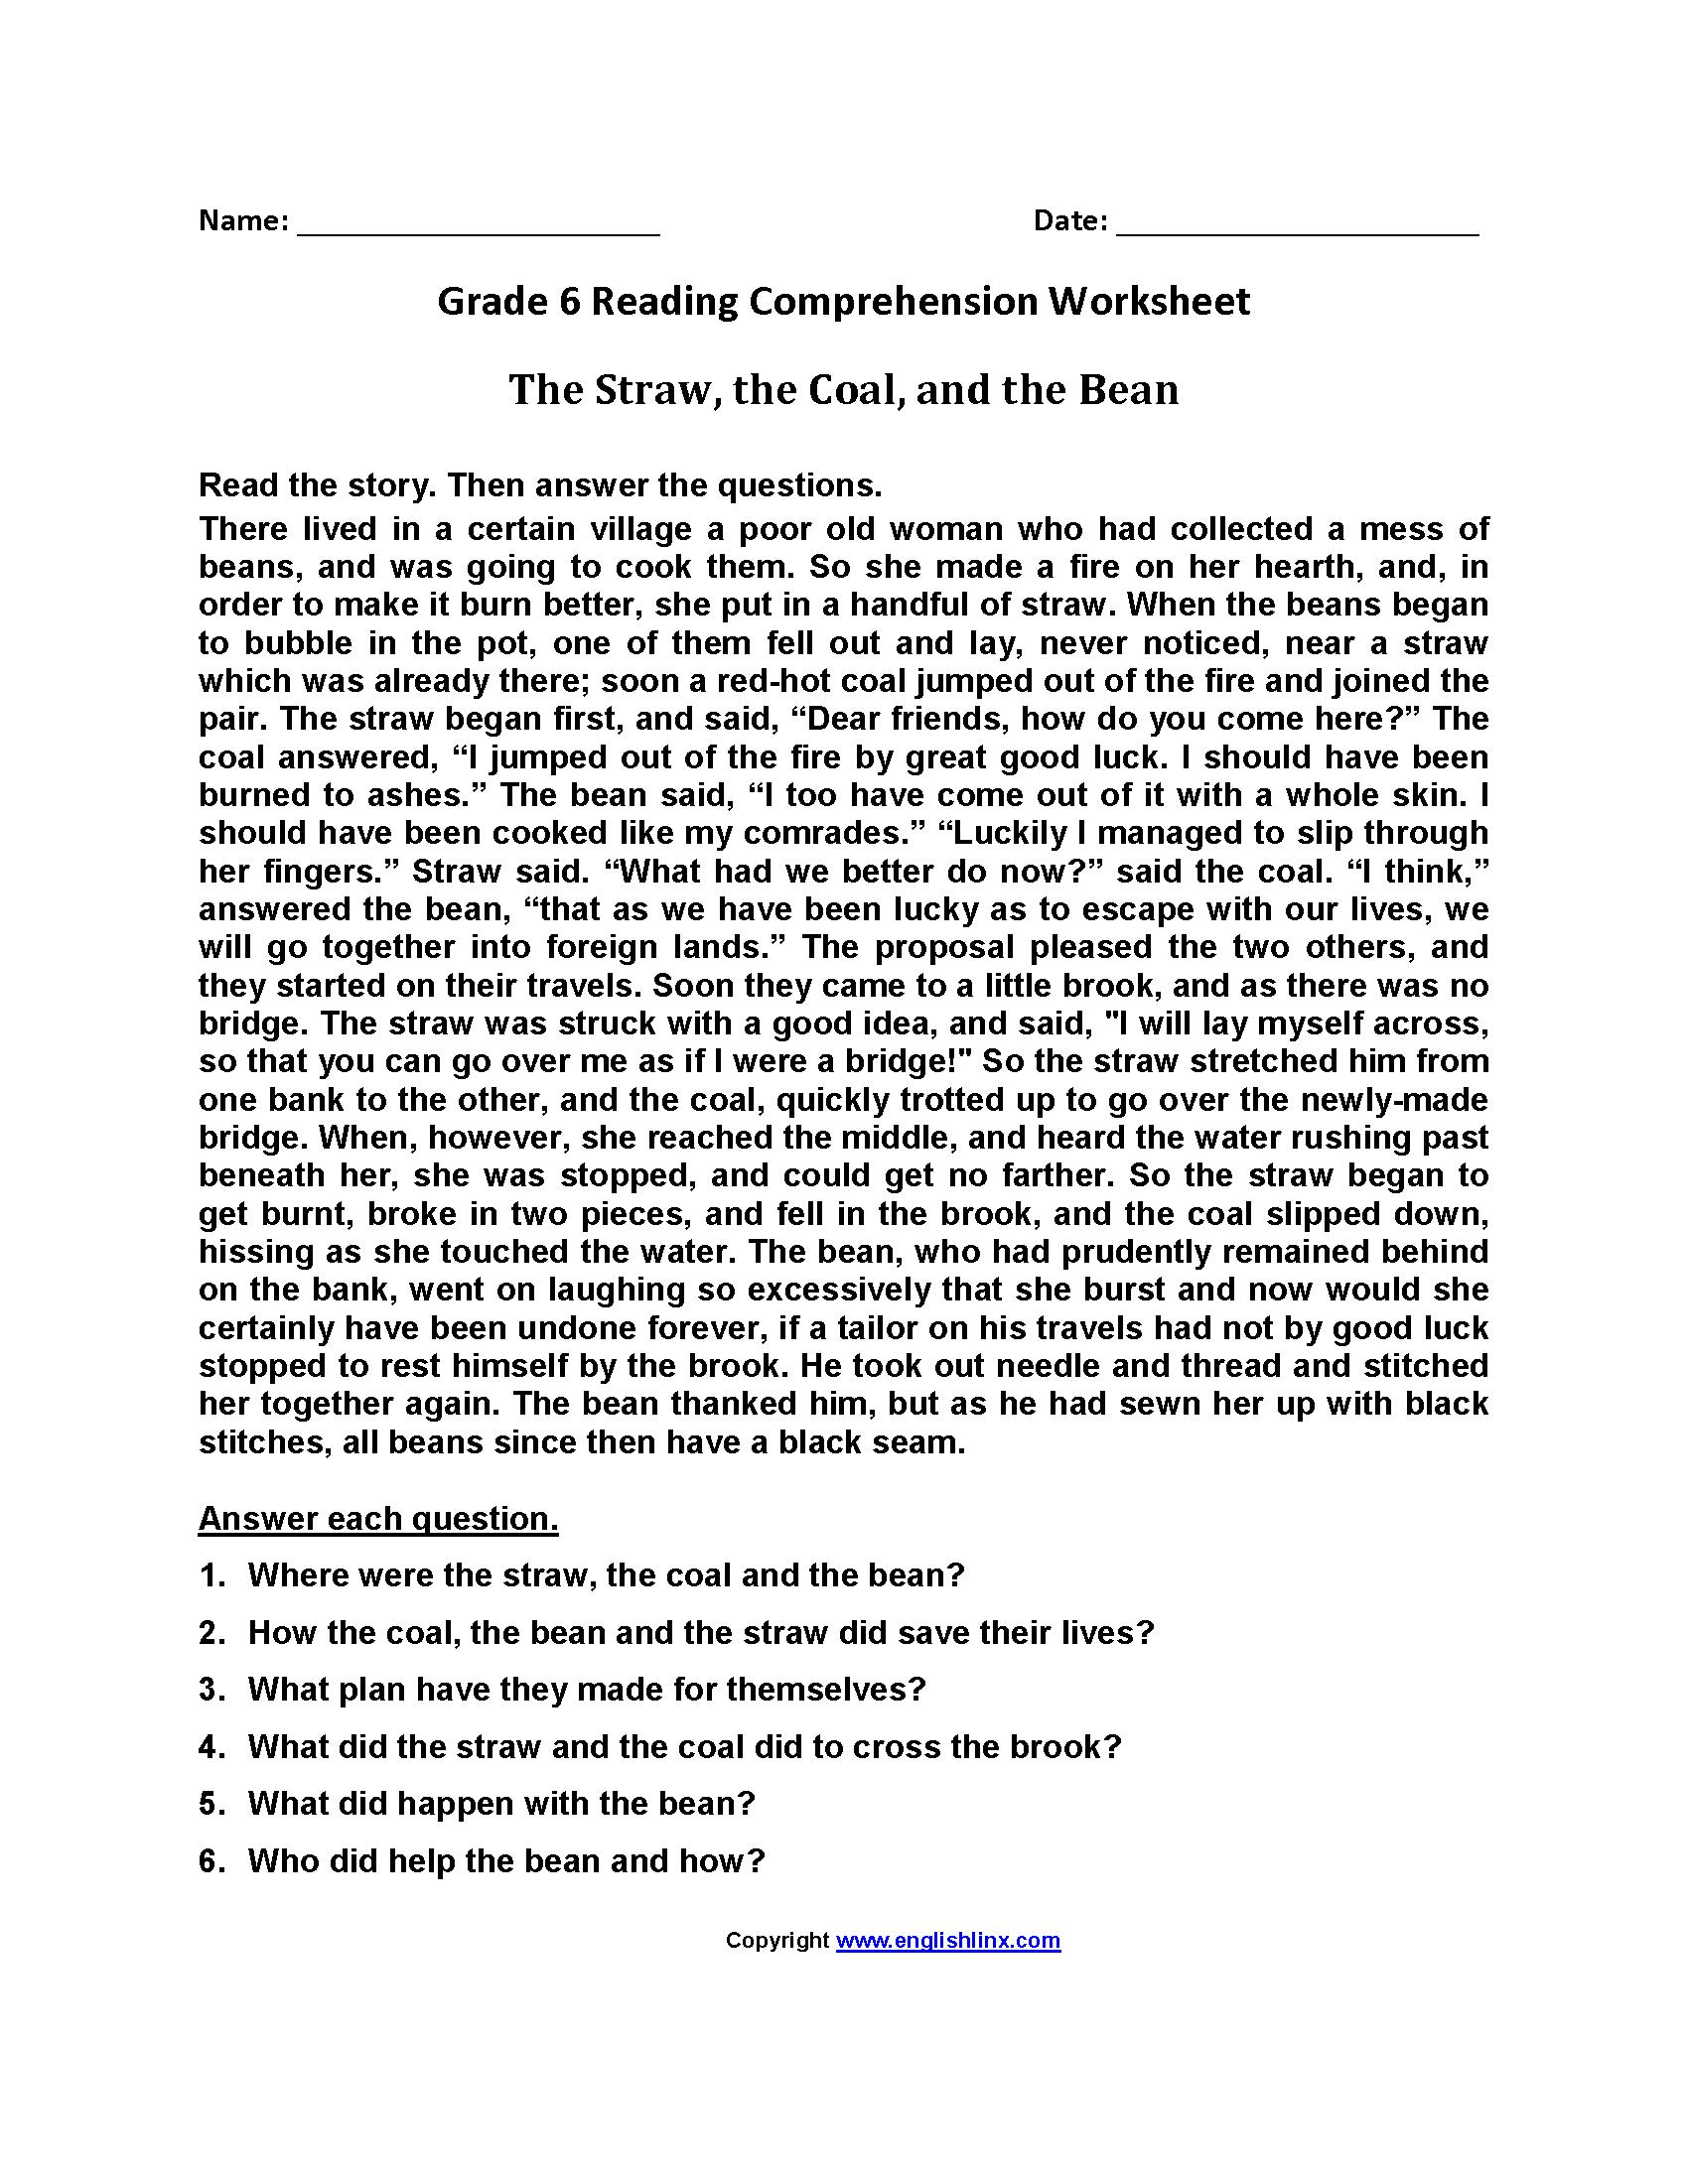 medium resolution of The Straw Coal and Bean\u003cbr\u003eSixth Grade Reading Worksheets   Reading comprehension  worksheets